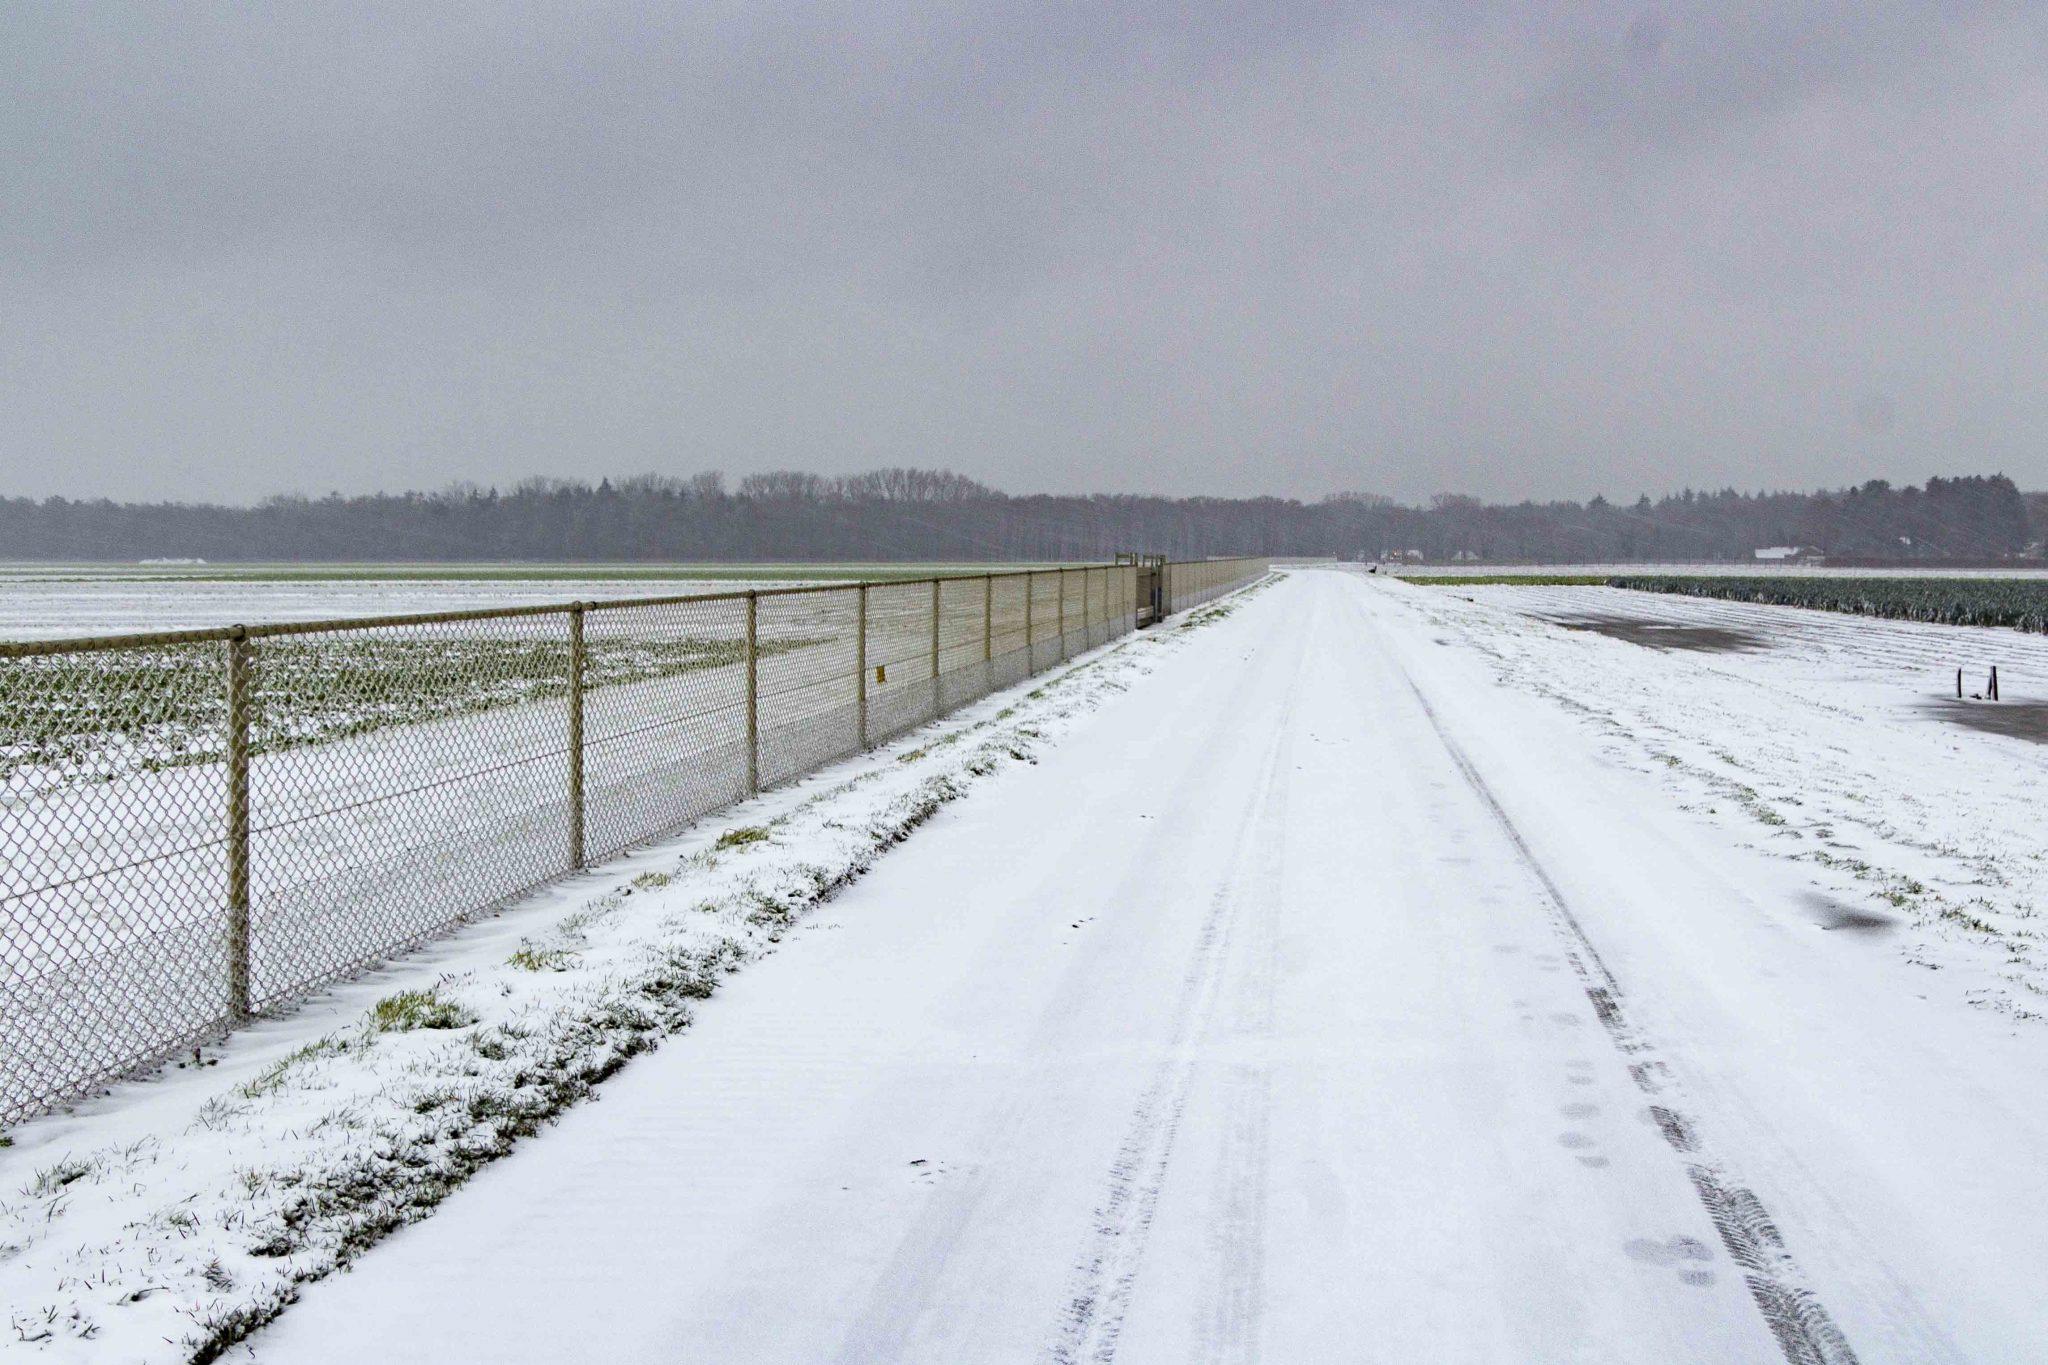 Sneeuw, kou, hardlopen.